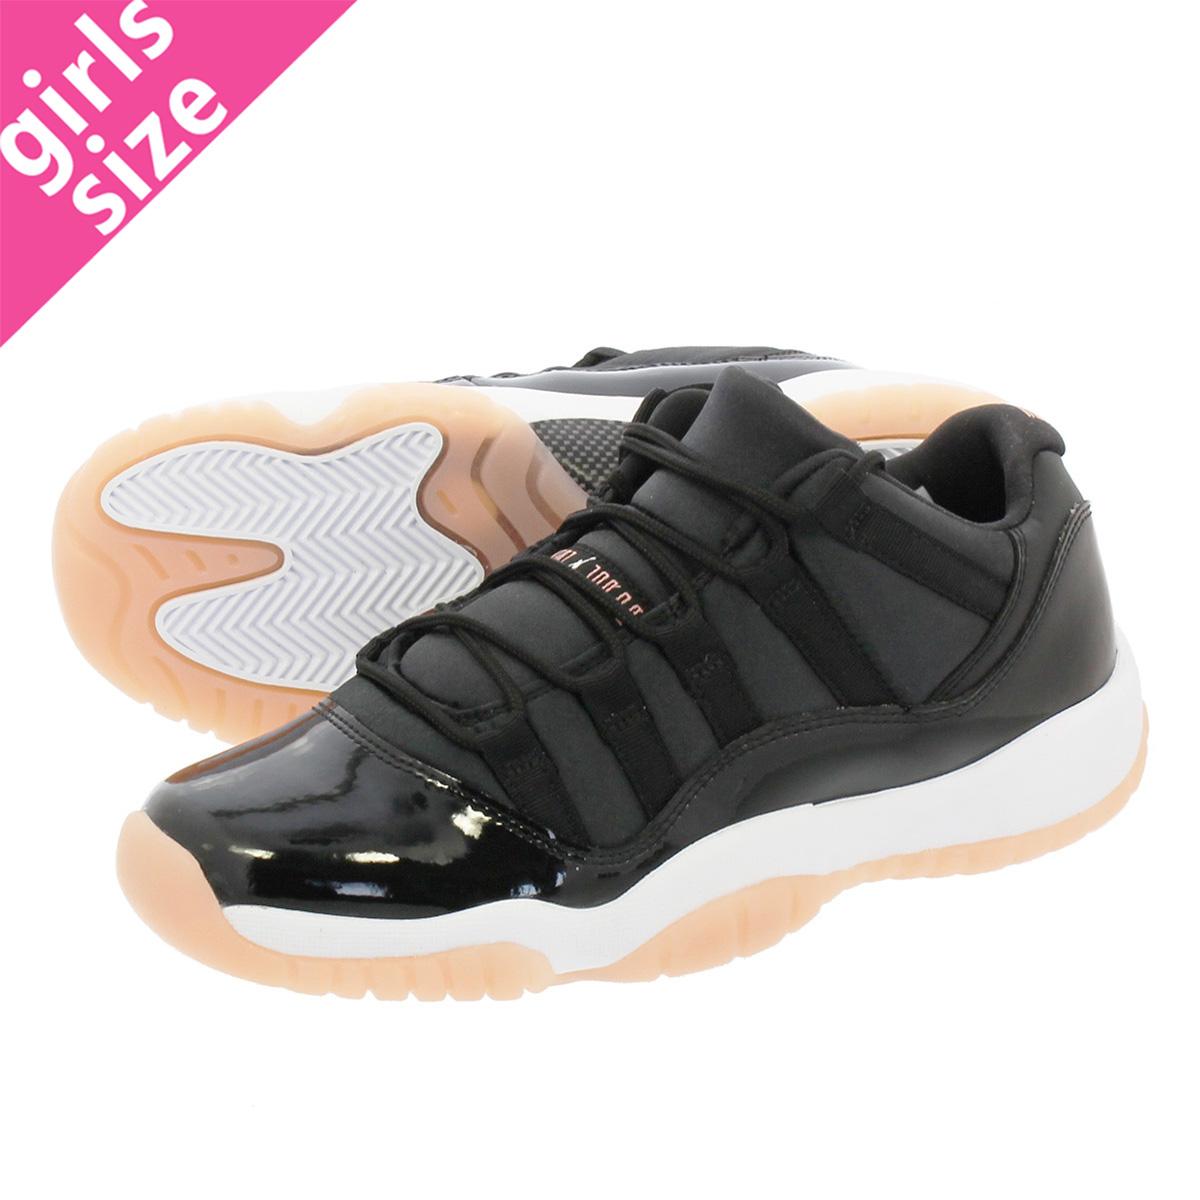 1549a1b33a4 NIKE AIR JORDAN 11 RETRO LOW GG Nike Air Jordan 11 nostalgic low BG BLACK BLEACHED  CORAL WHITE 580